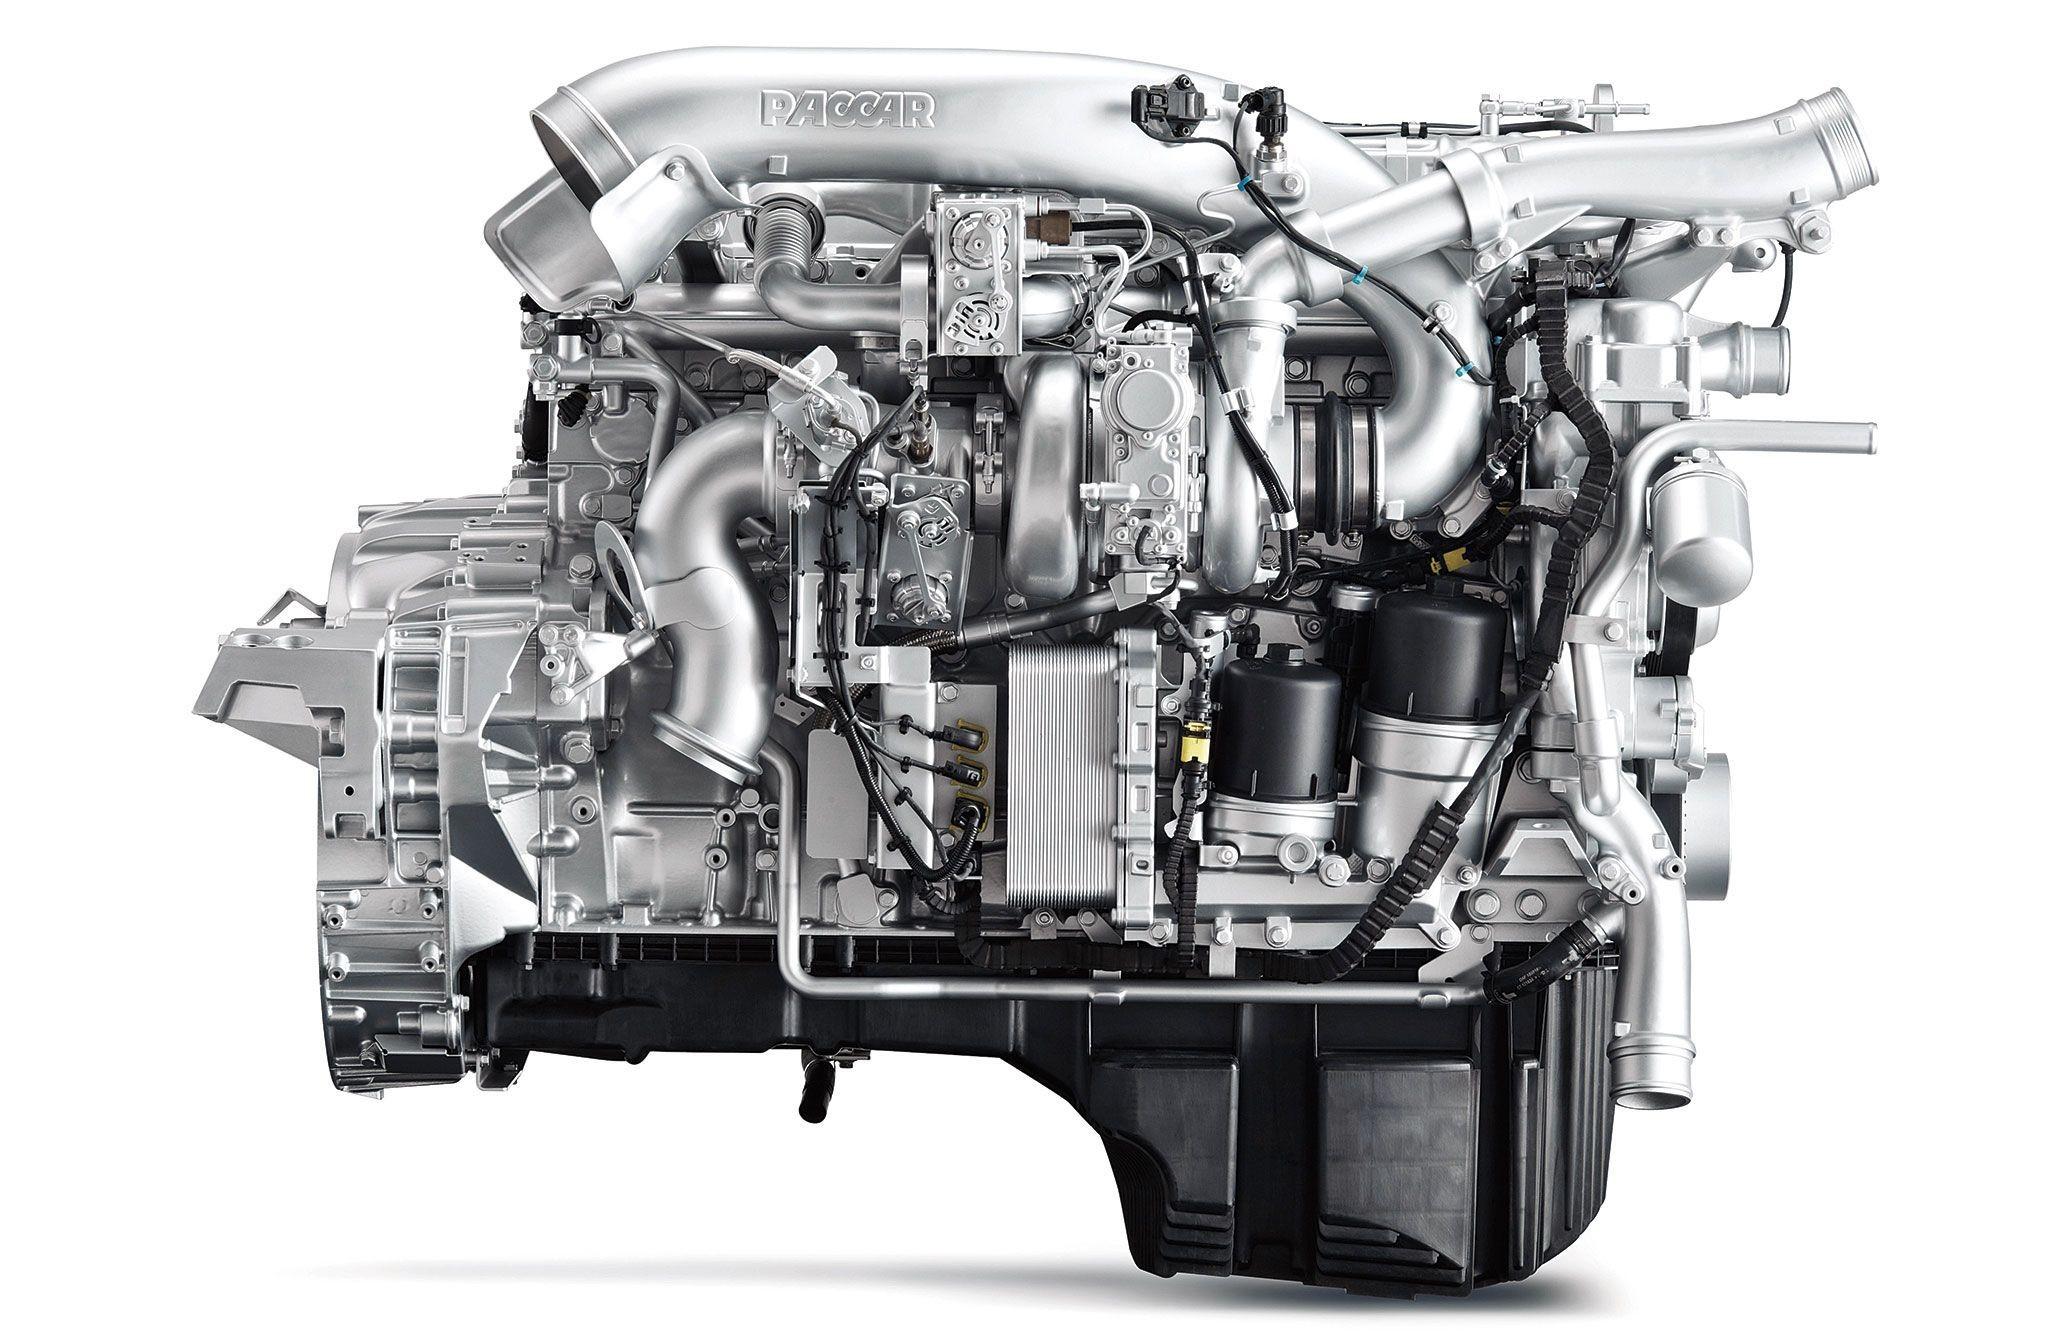 Paccar Mx13 Ecu Wiring Diagram] Hand Truck Diagram Full Version Hd Quality Truck Of Paccar Mx13 Ecu Wiring